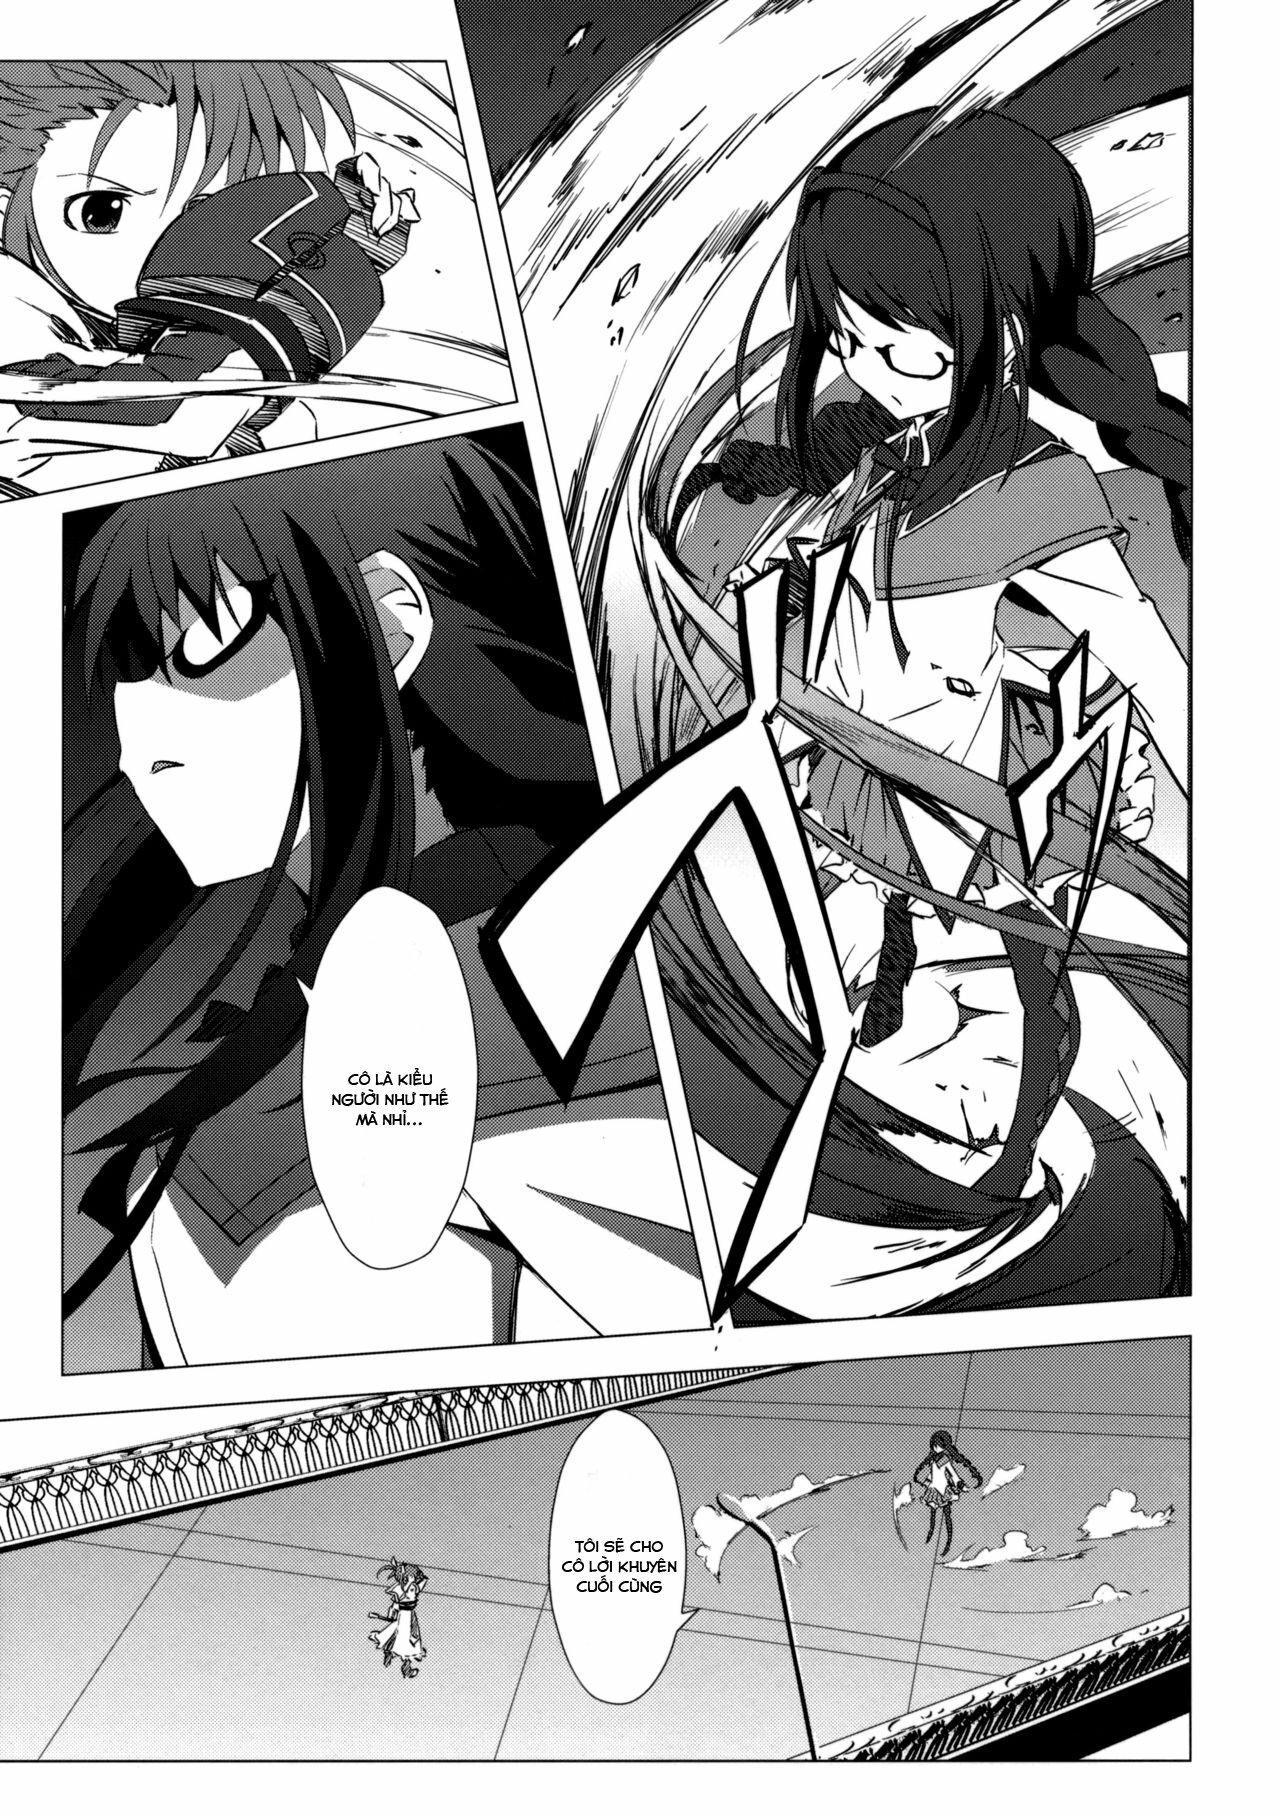 Mahou Shoujo Lyrical Nanoha x Madoka (Crossover): Chapter 3